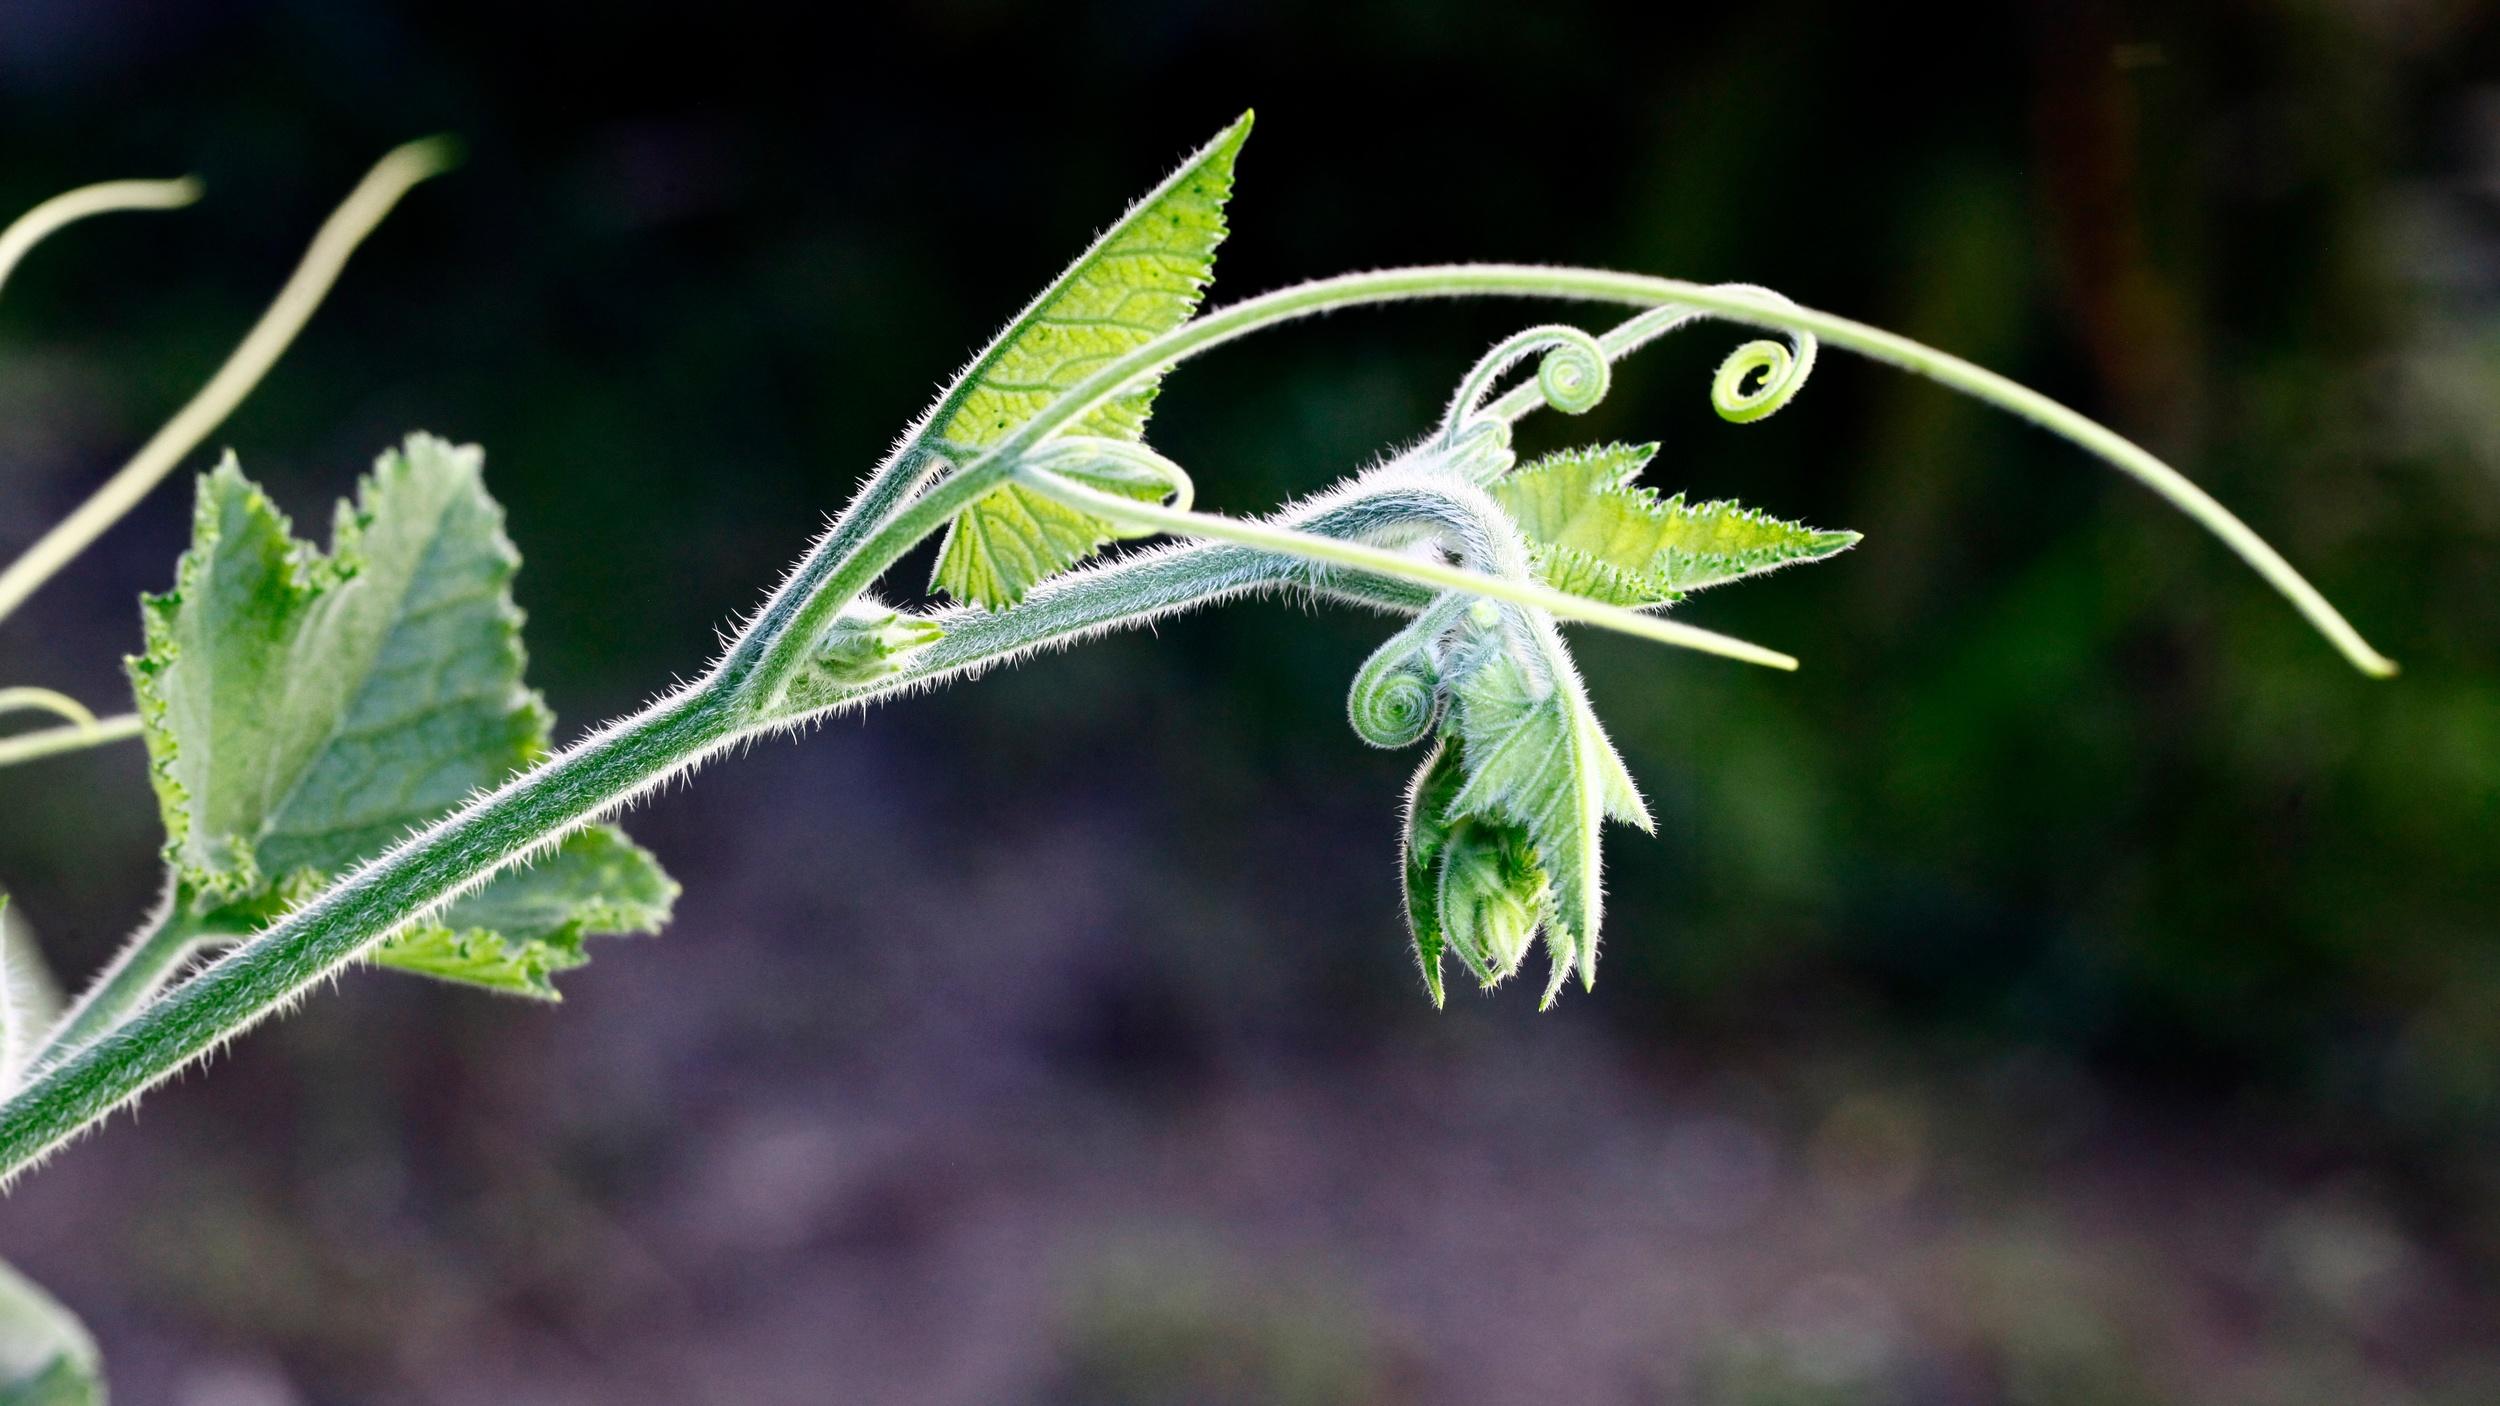 ashes situla crysalis maybe on leaf nepal Up cW.jpeg